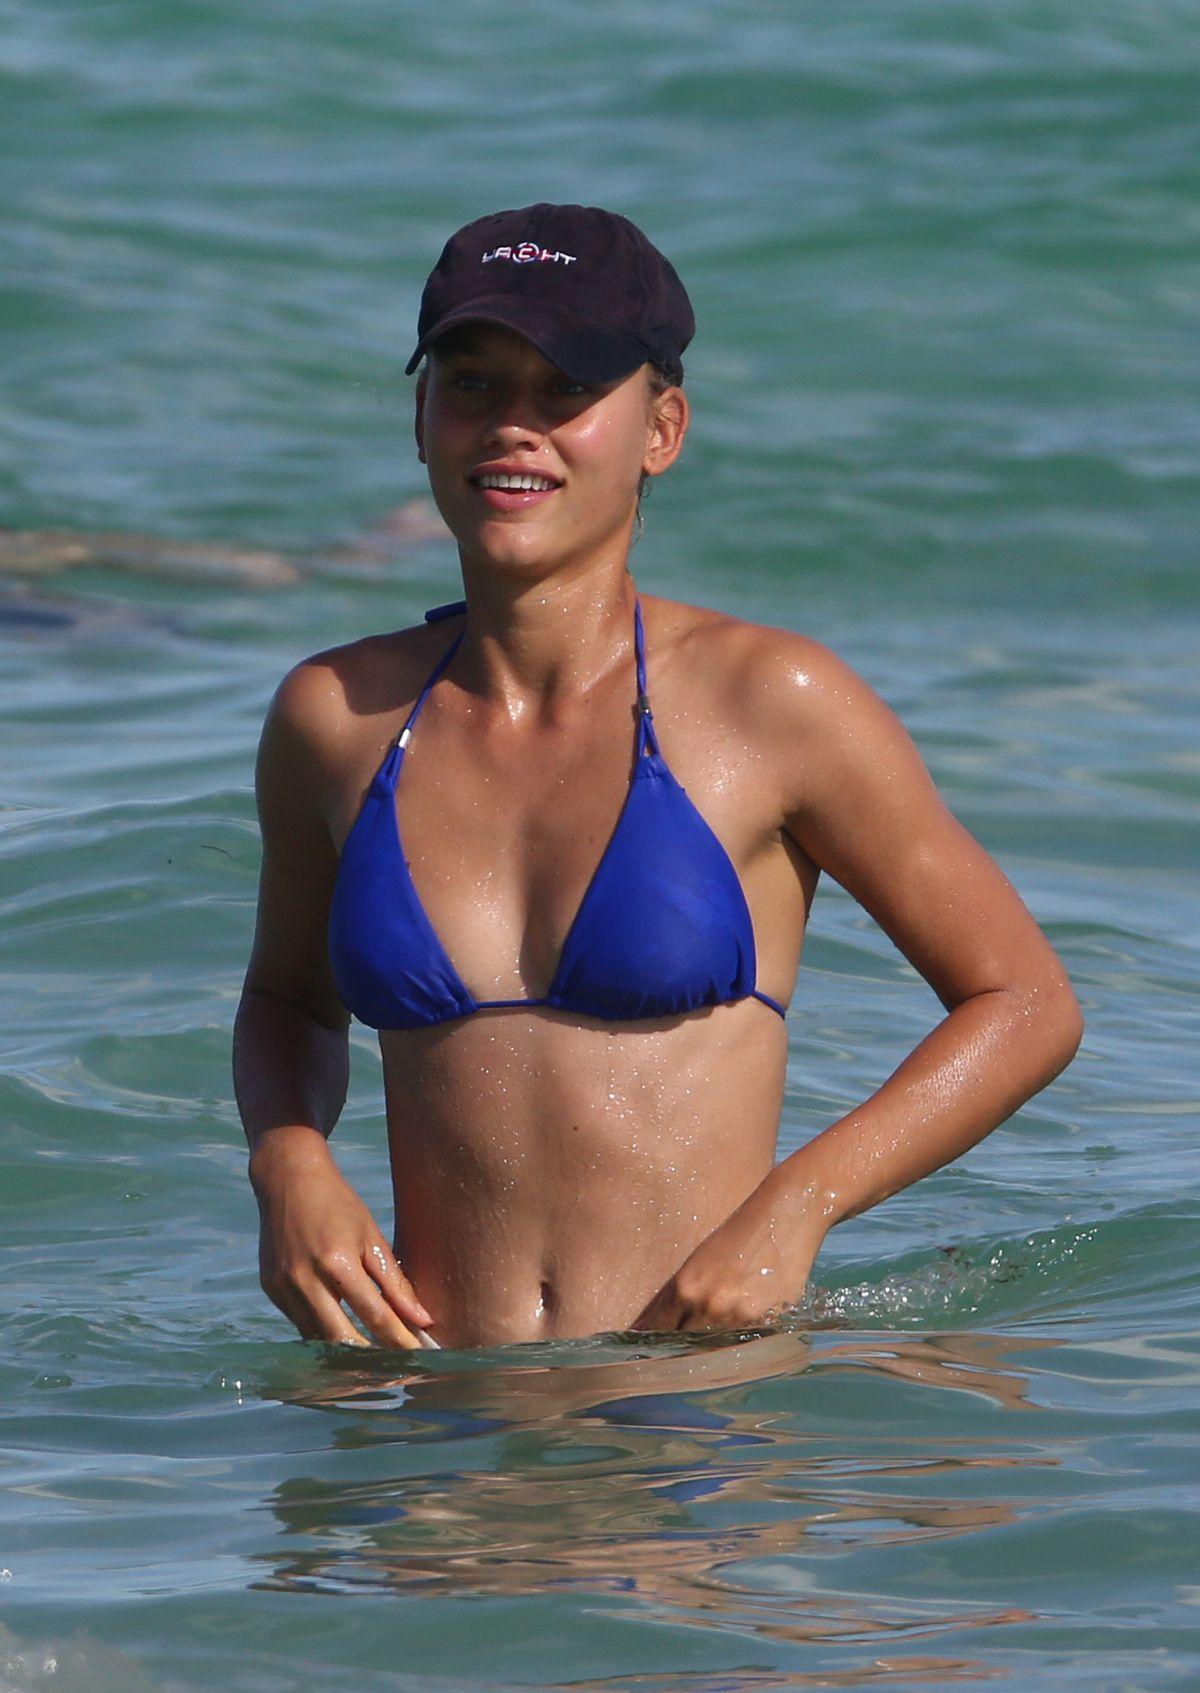 Chase Carter in Bikini at the beach in Miami Pic 10 of 35